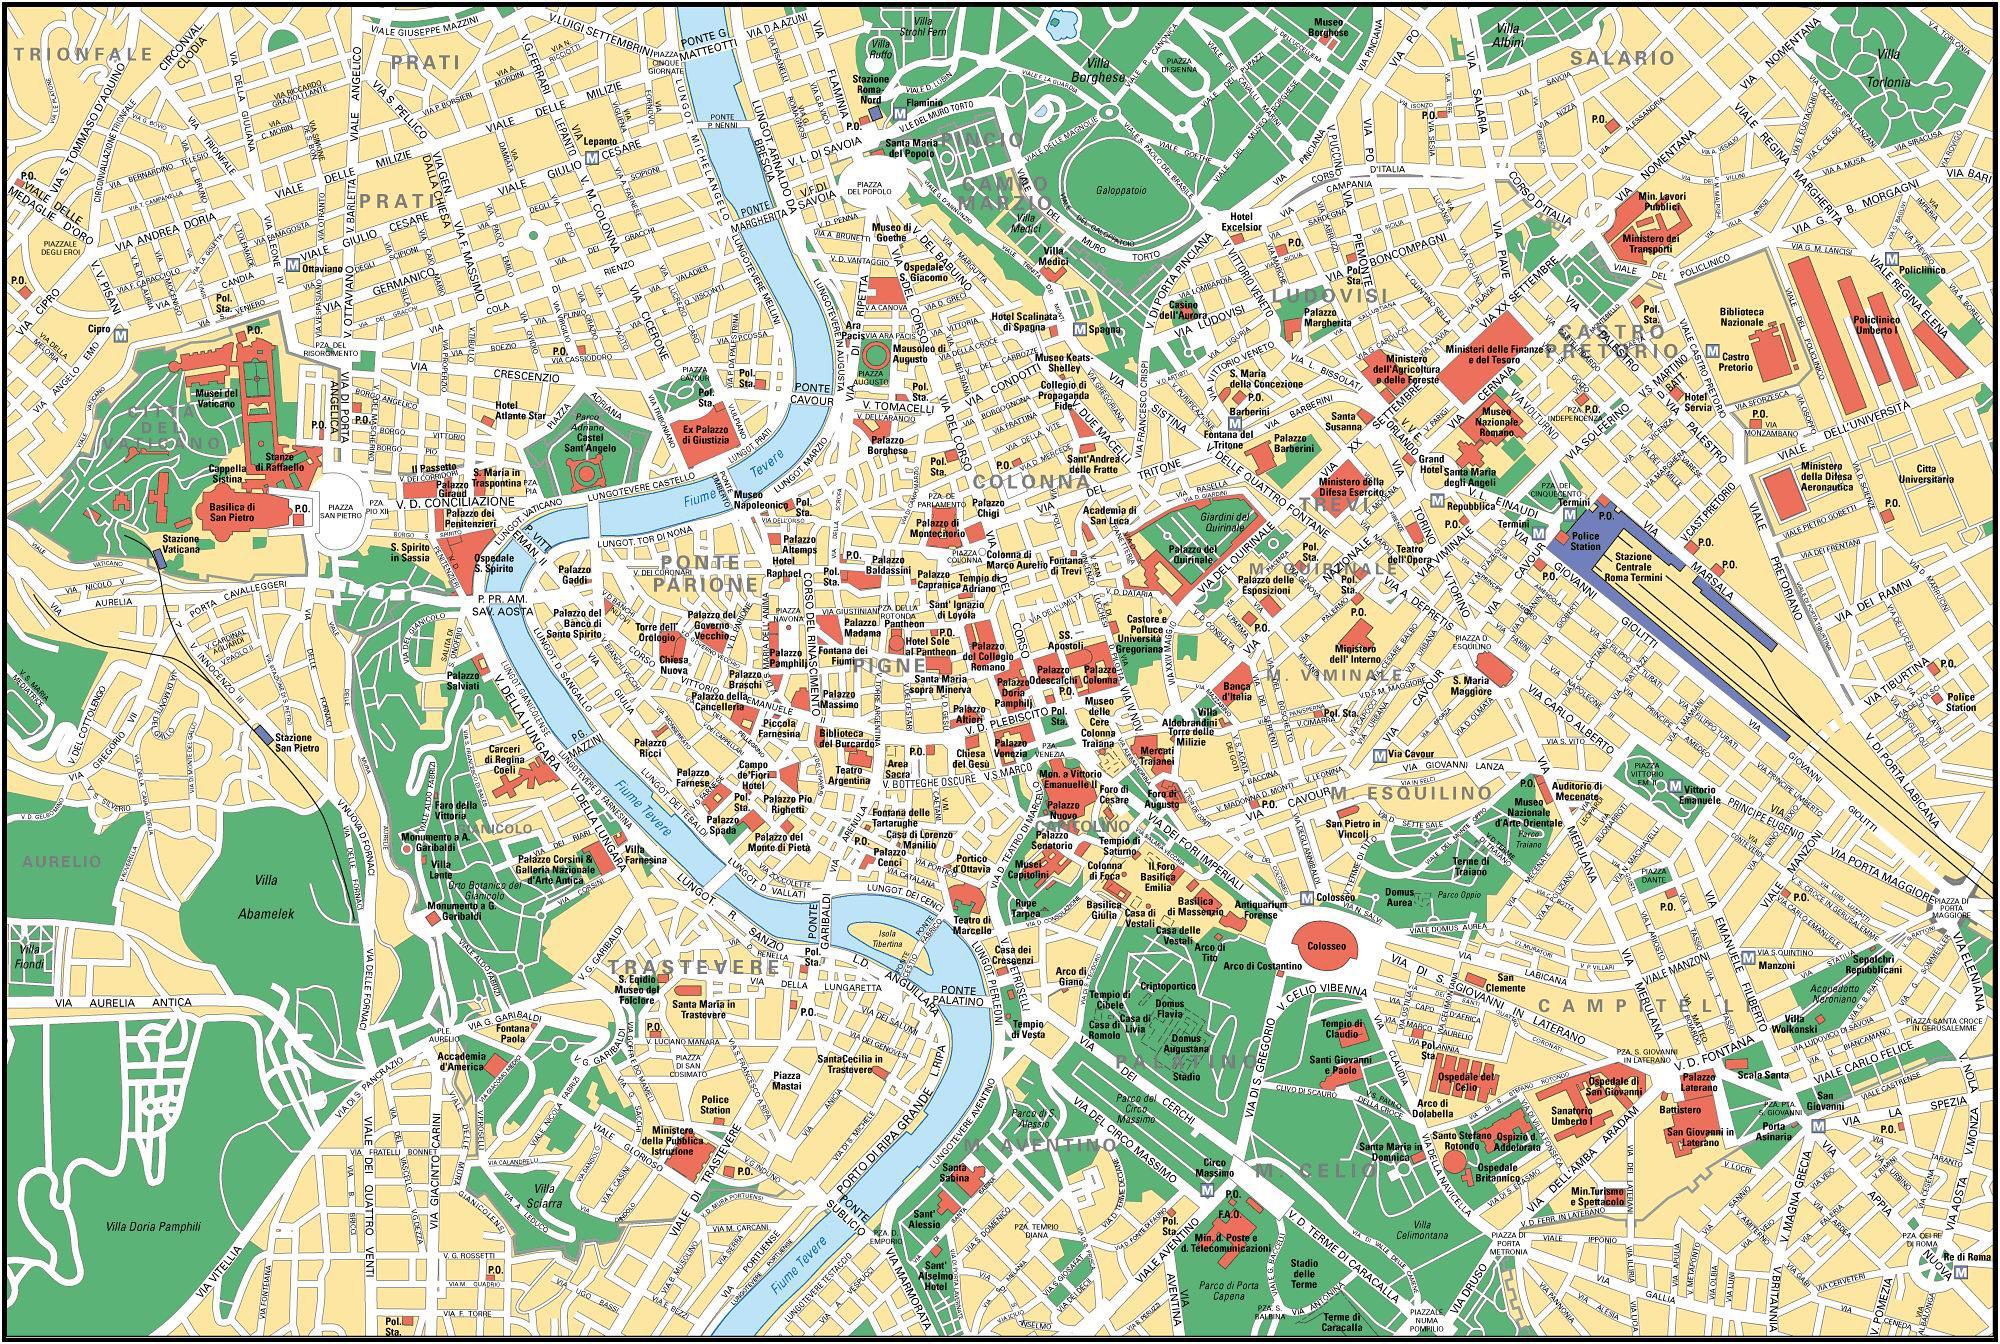 Rom Street Map Street Kort Over Rom Italien Lazio Italien